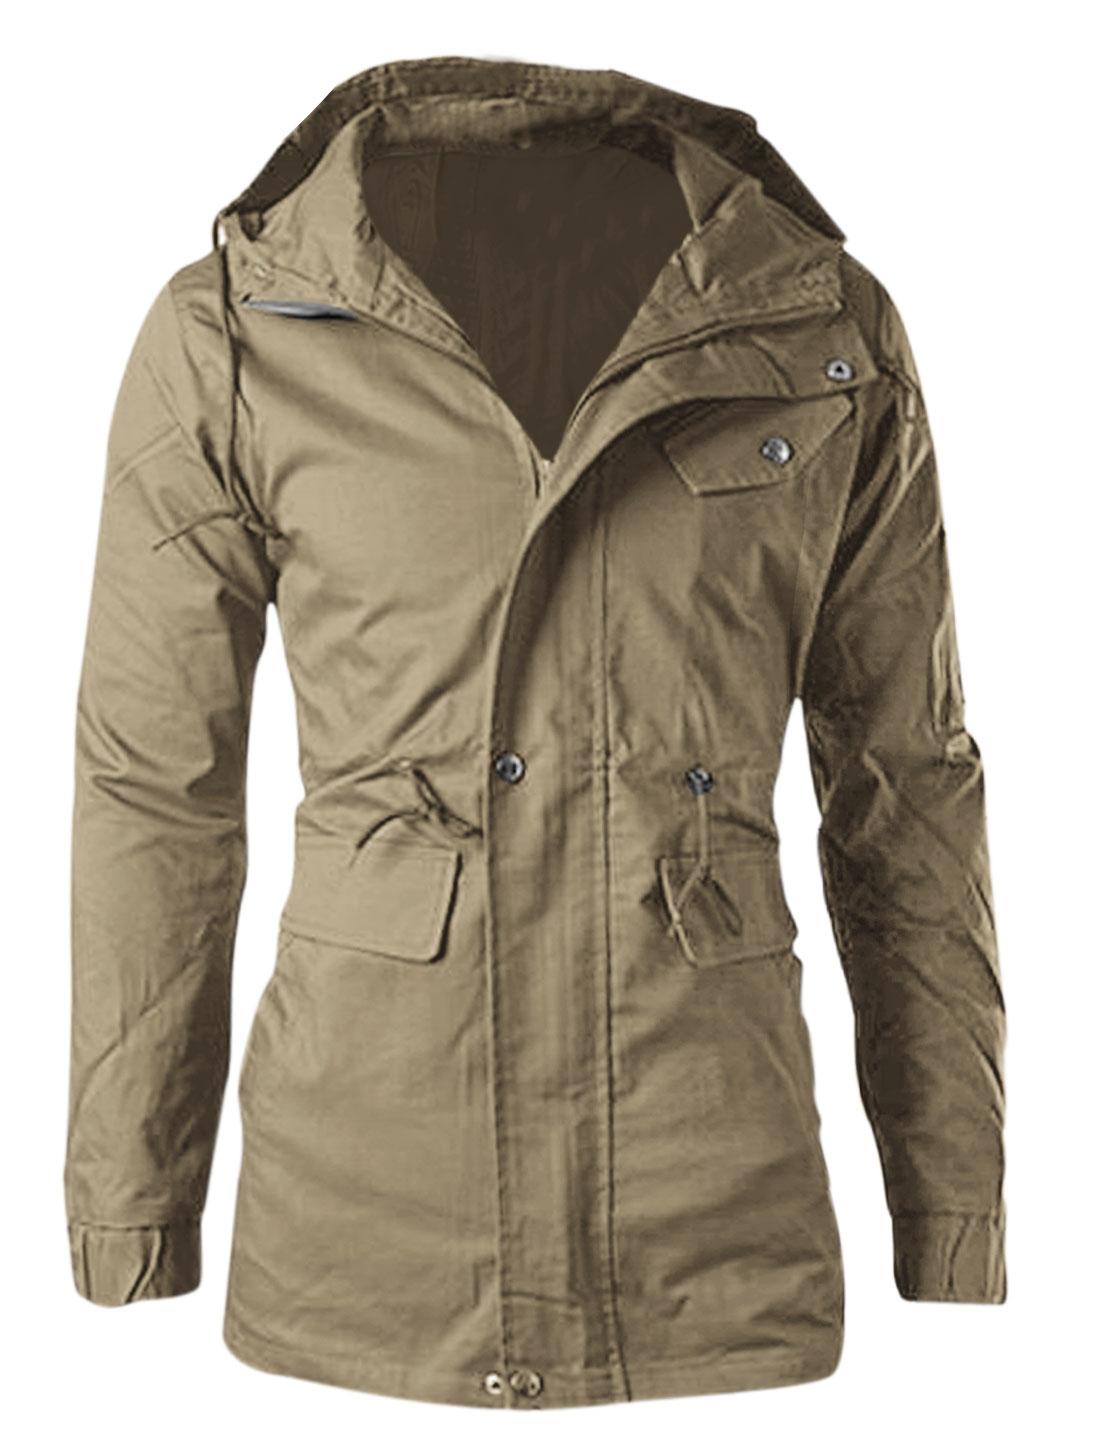 Men Zipper-Up Elastic Cuffs Drawcord Waist Lining Fashion Jacket Khaki M